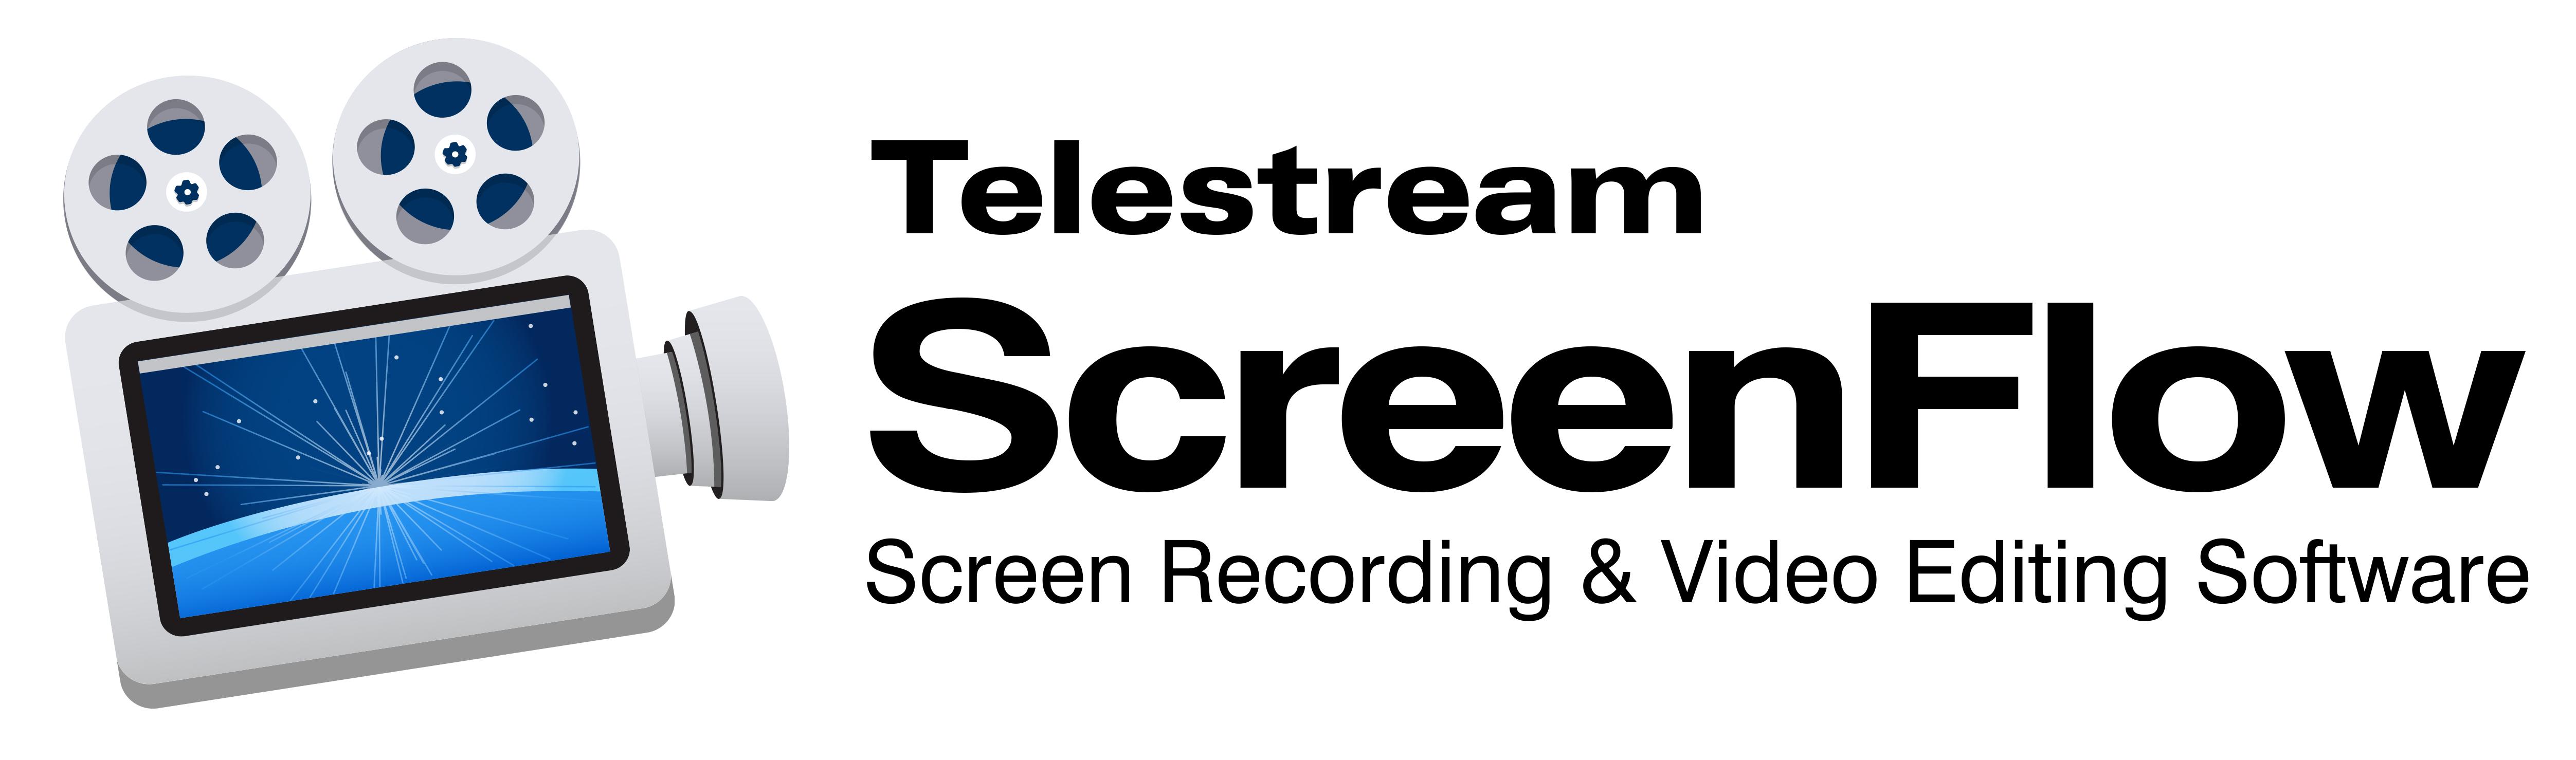 screenflow b2b marketing video software